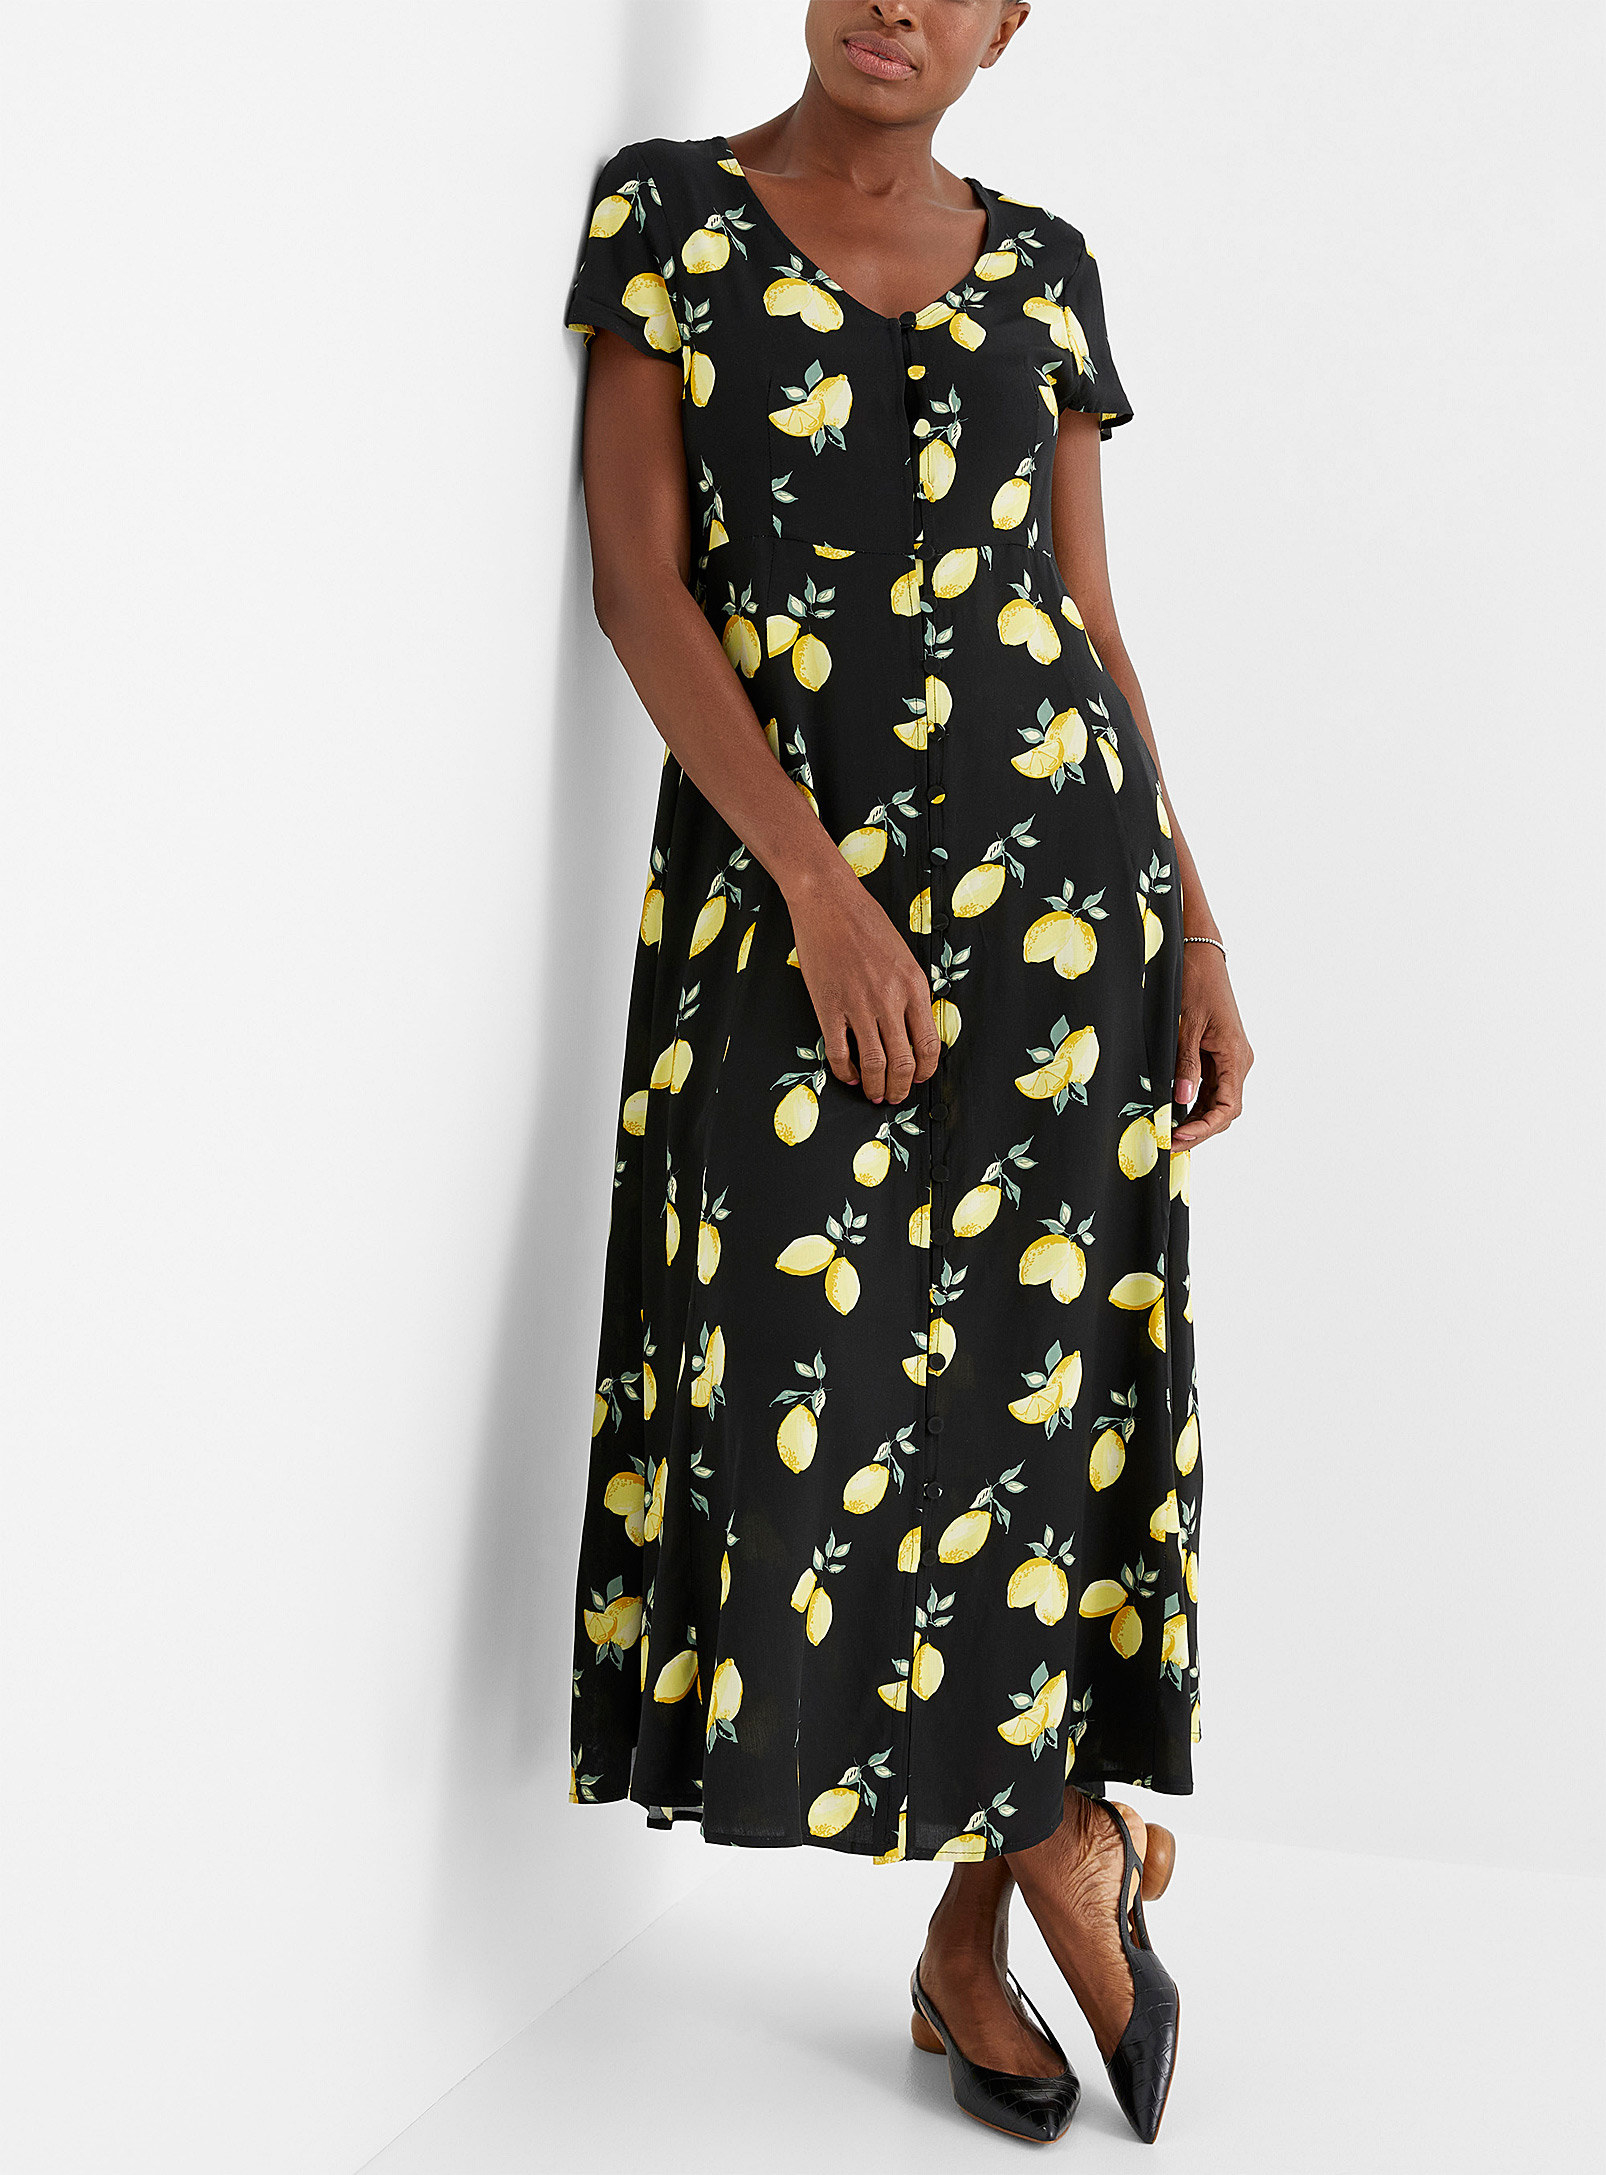 A person wearing a long dress with a lemon pattern